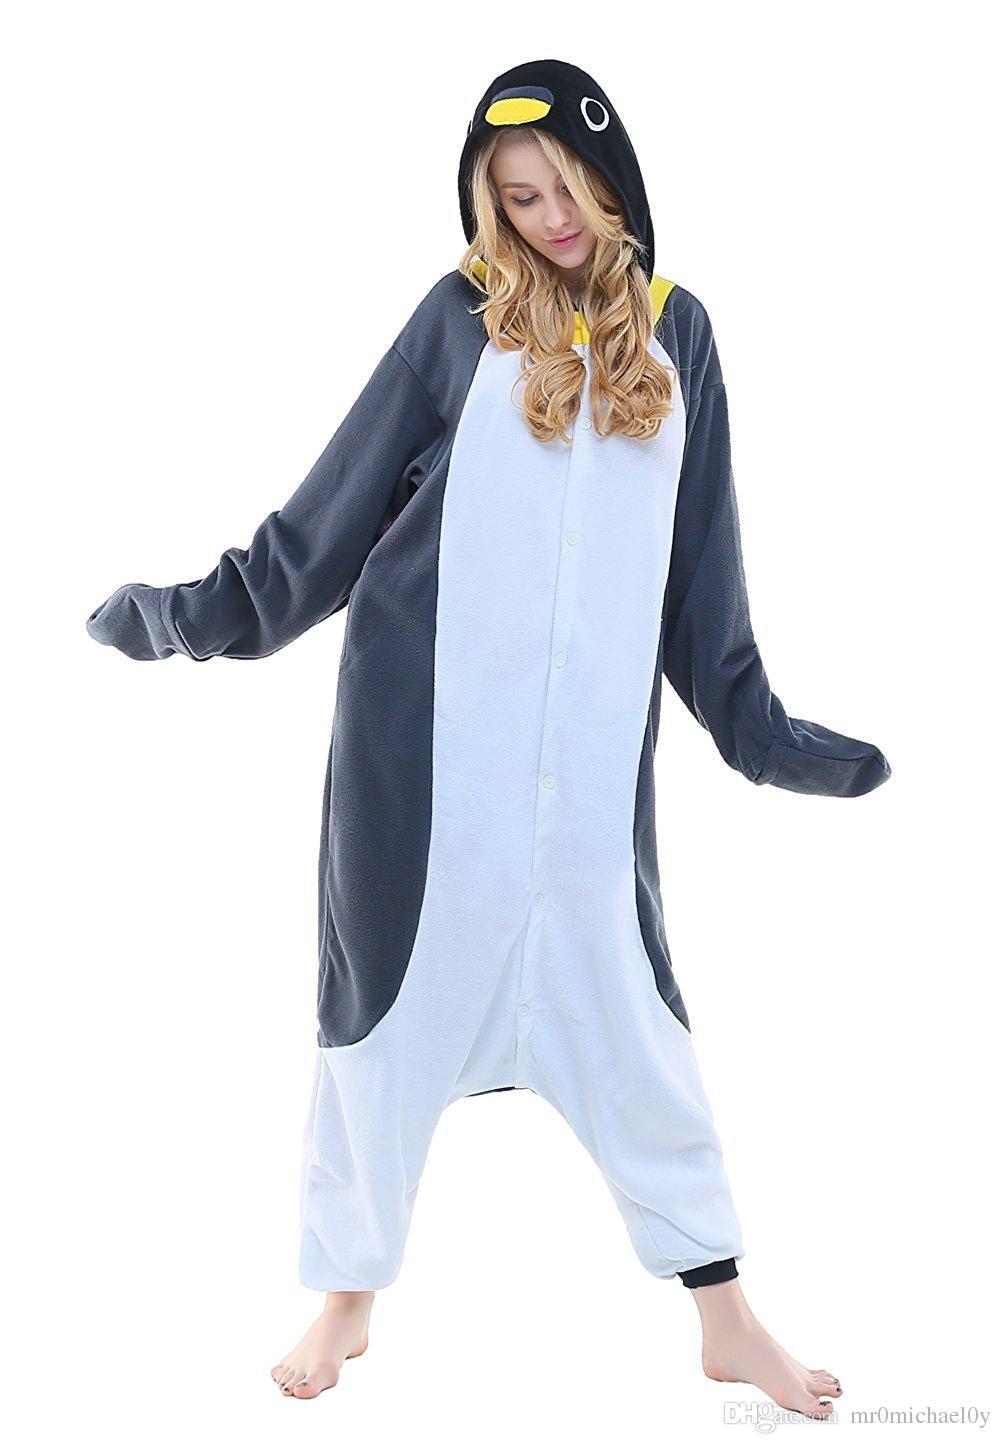 Llama Onesie for Adults | Adult Animal Onesies | Adult Pajama Onesie